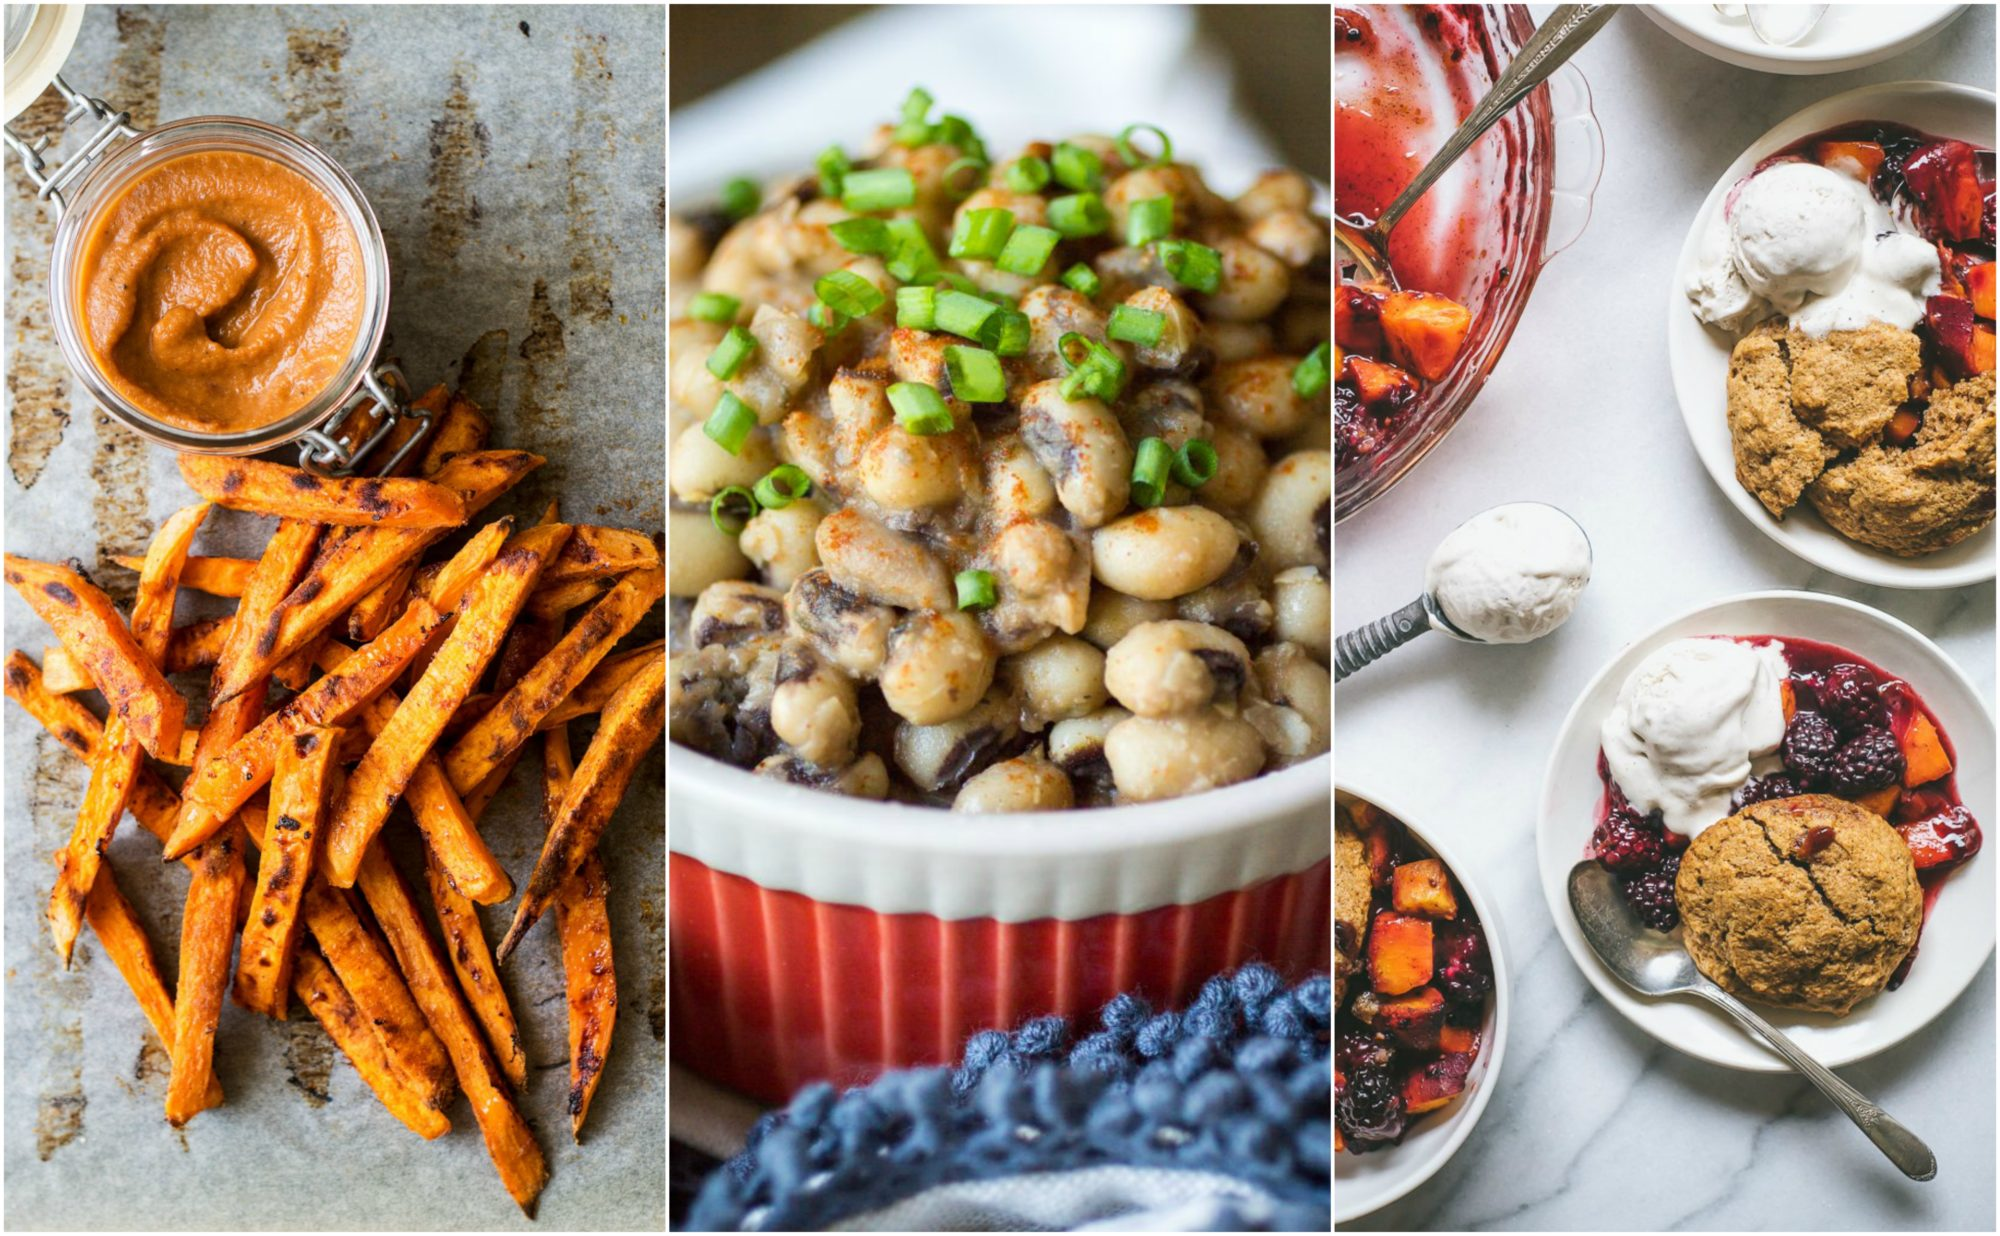 12 vegan soul food recipes vegan food lover 12 vegan soul food recipes forumfinder Choice Image